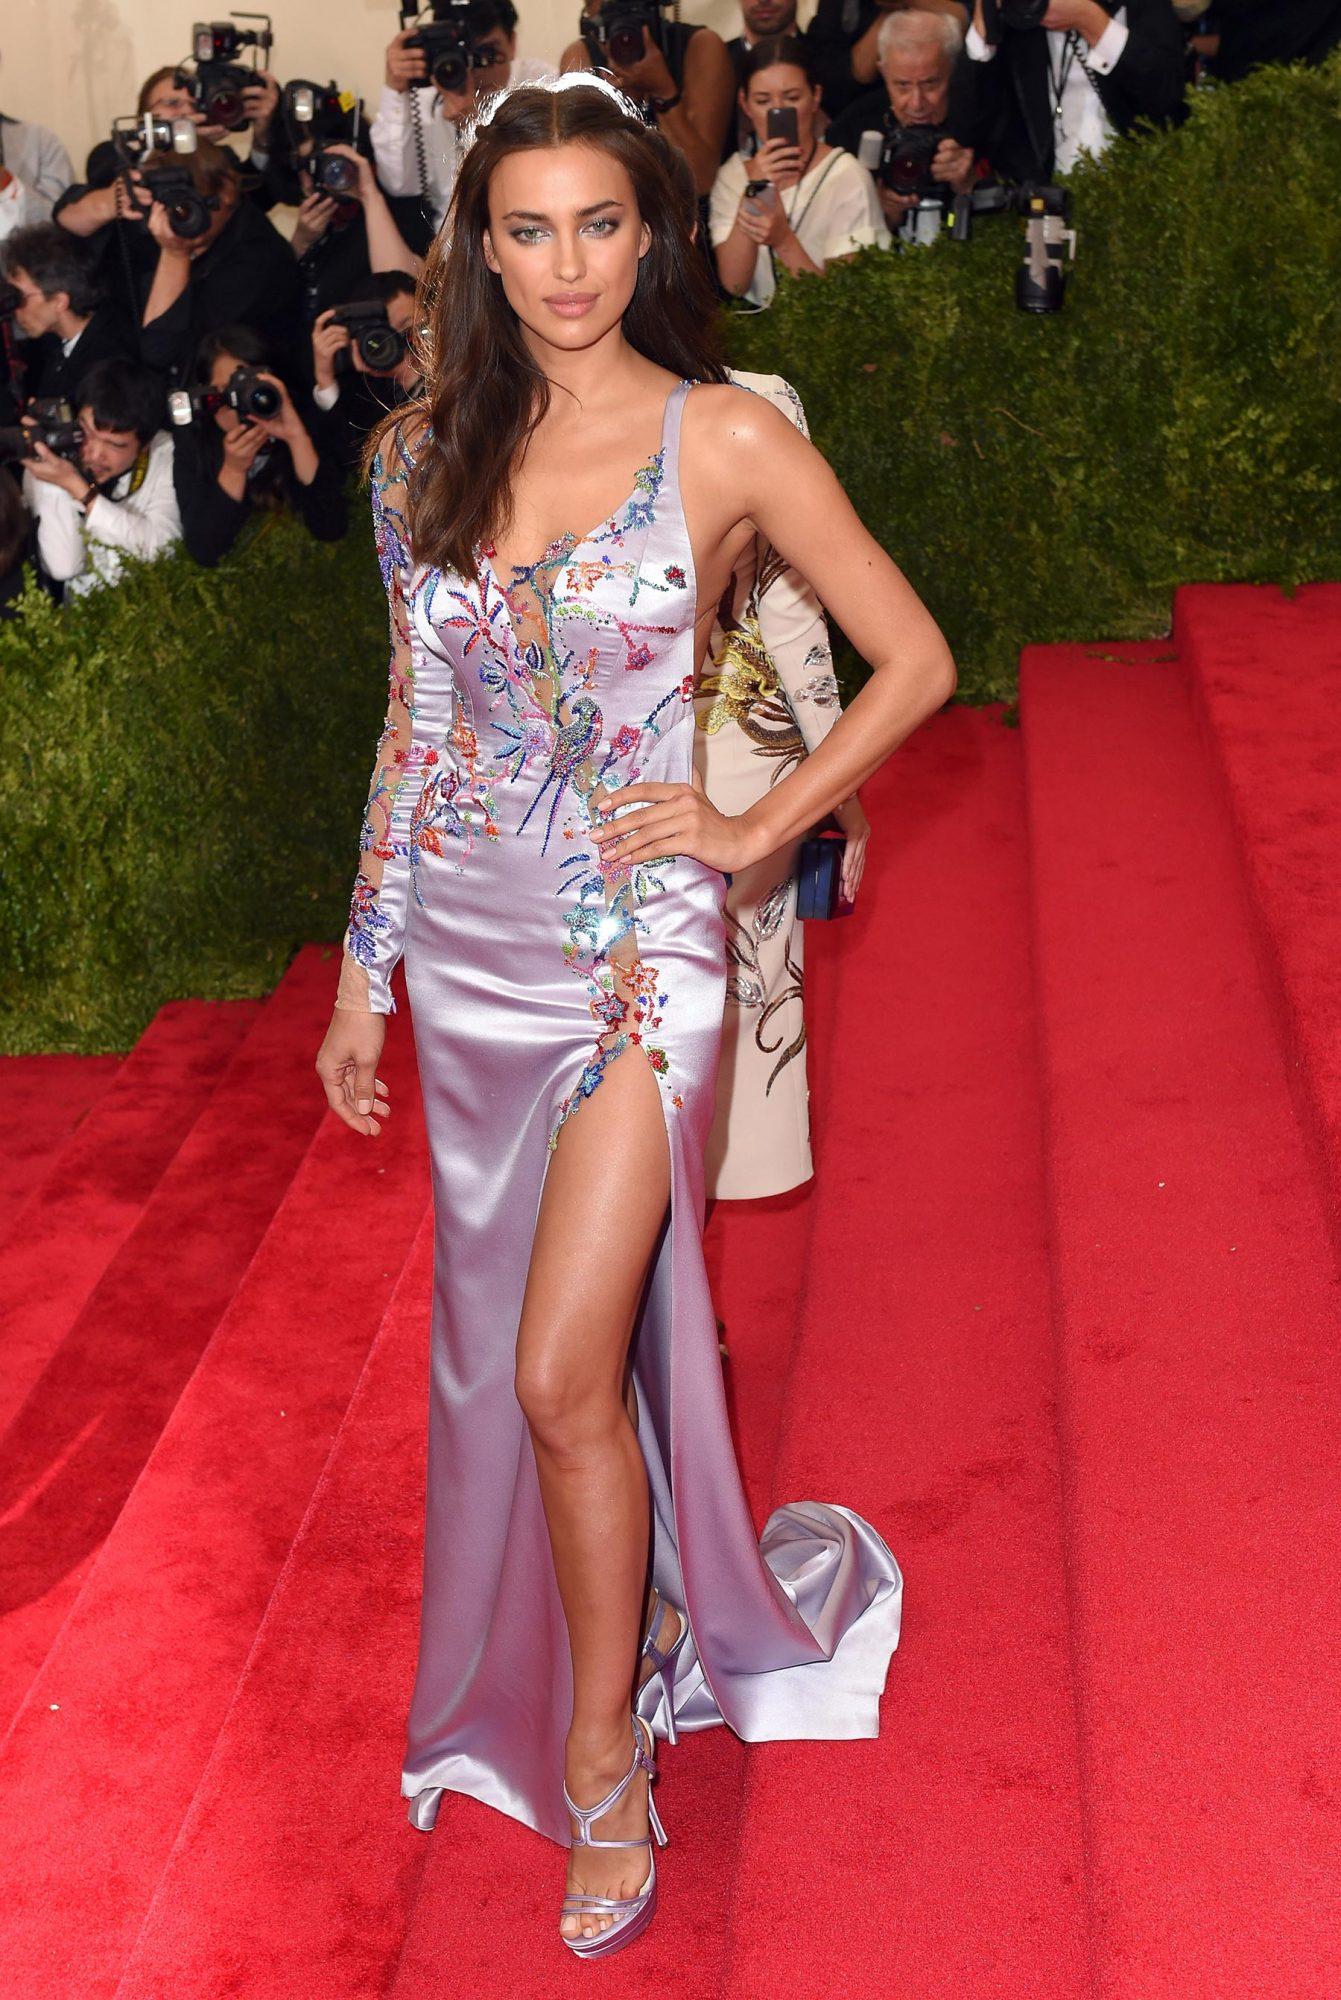 Bradley Cooper Irina Shayk Walk Red Carpet At Met Gala Ew Com